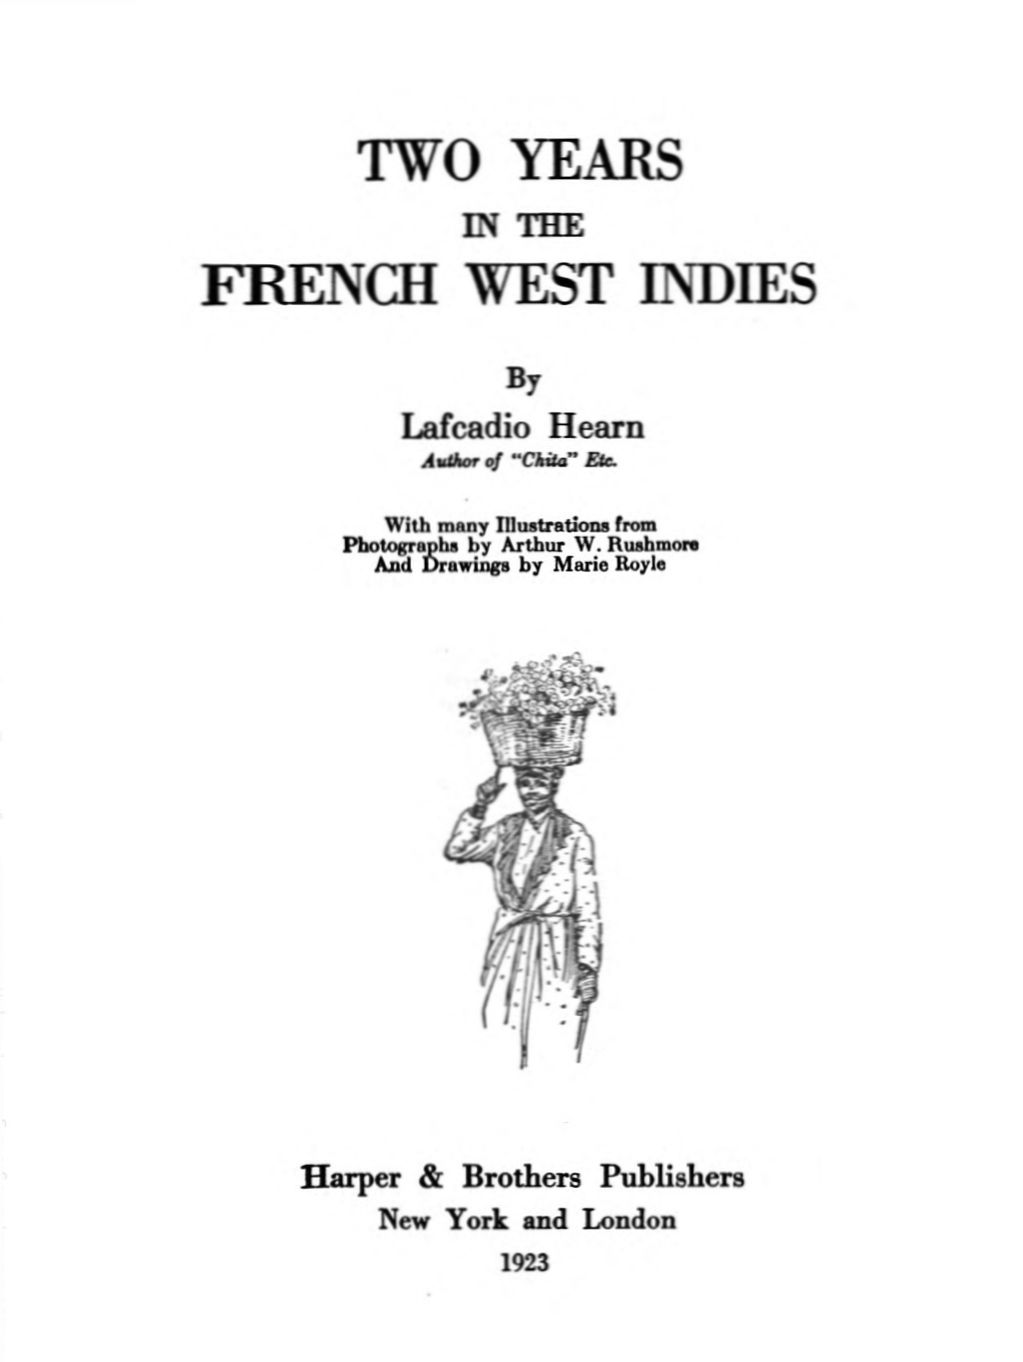 Le Gout De Sa Piqure : piqure, Project, Gutenberg, EBook, Years, French, Indies,, Lafcadio, Hearn.